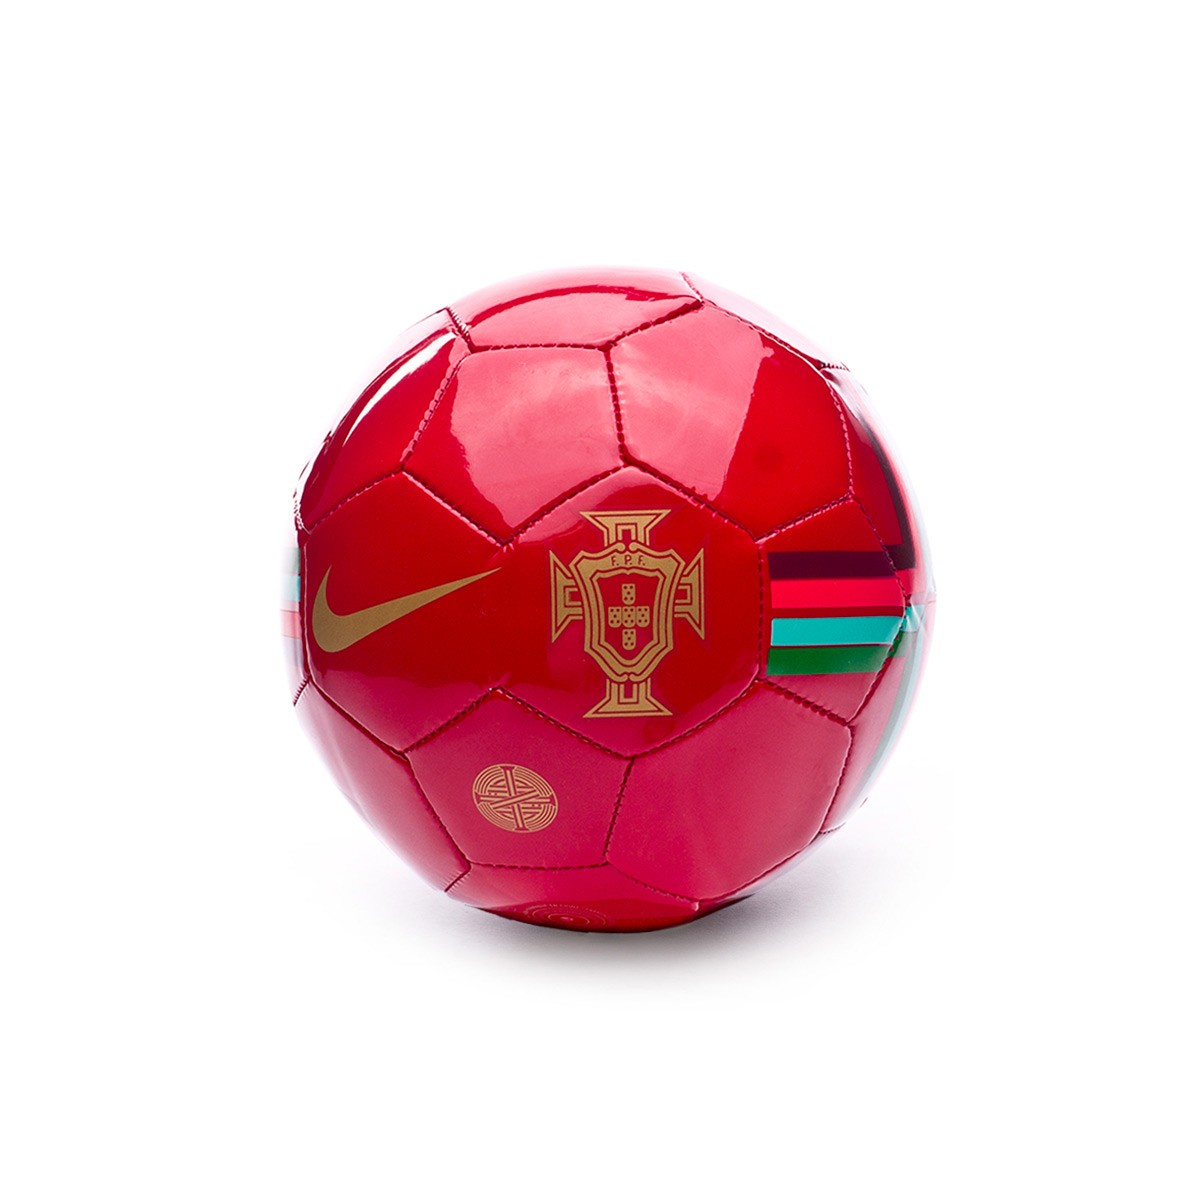 Ball Nike Mini Portugal Skills 2018-2019 Gym red-Metallic gold ... d9ed9a77d3a1f